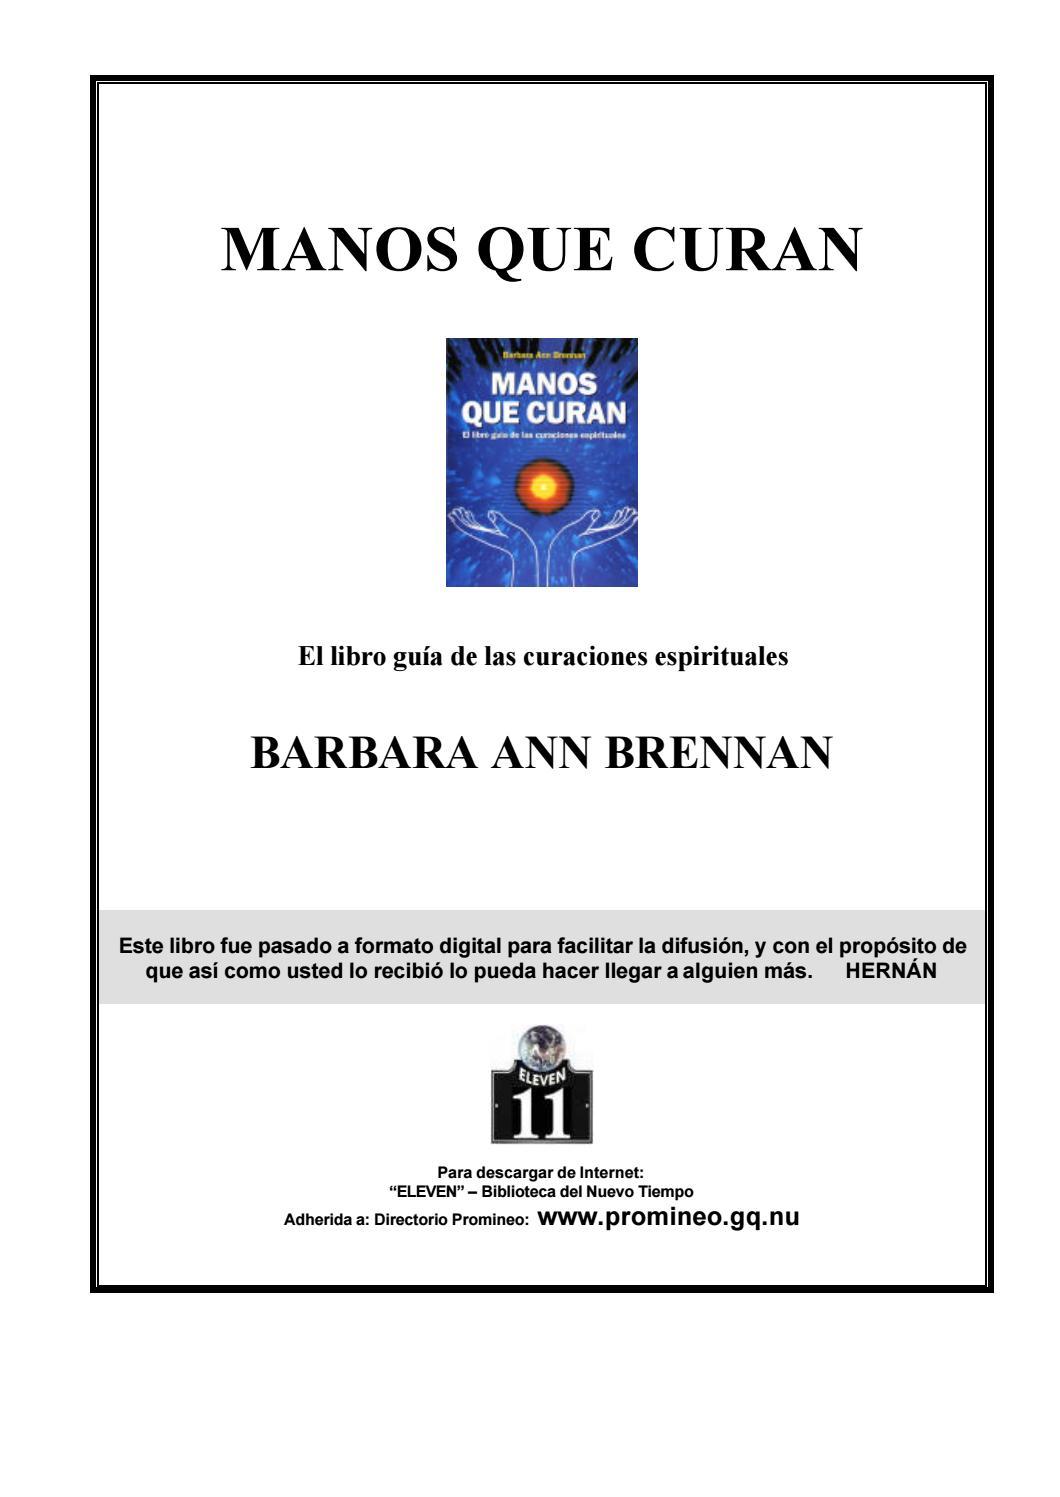 Manos que curan -Bárbara Ann Brennan- by Estela Fontán - issuu